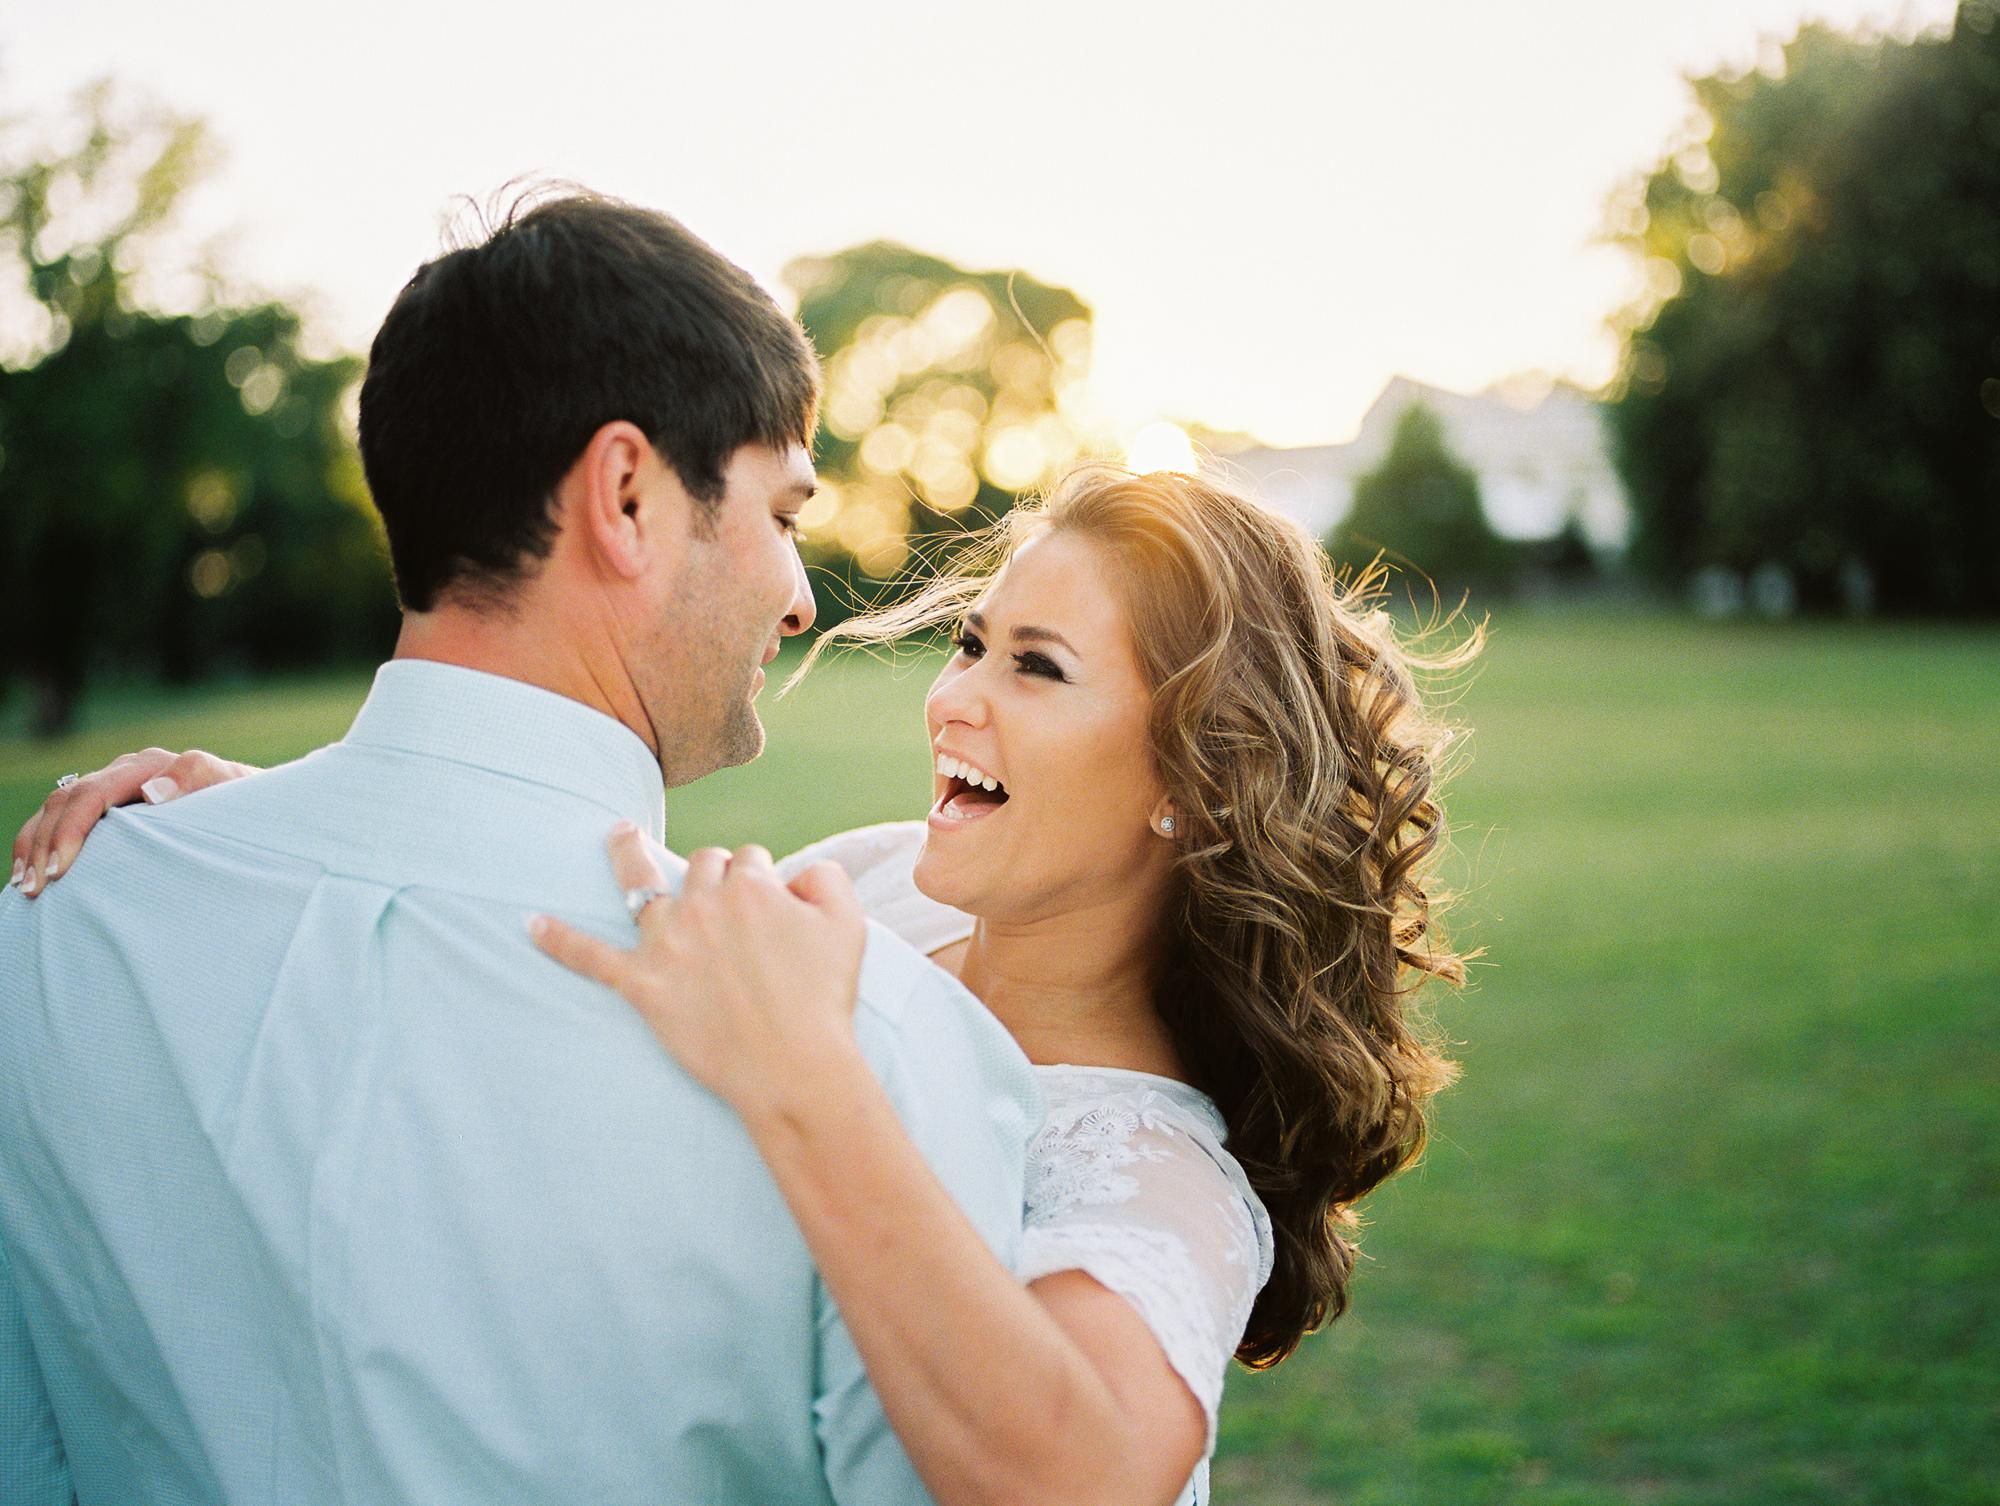 Victoria & Justin - Engaged - Memphis, TN - © Kaitlyn Stoddard -Carter-1.jpg